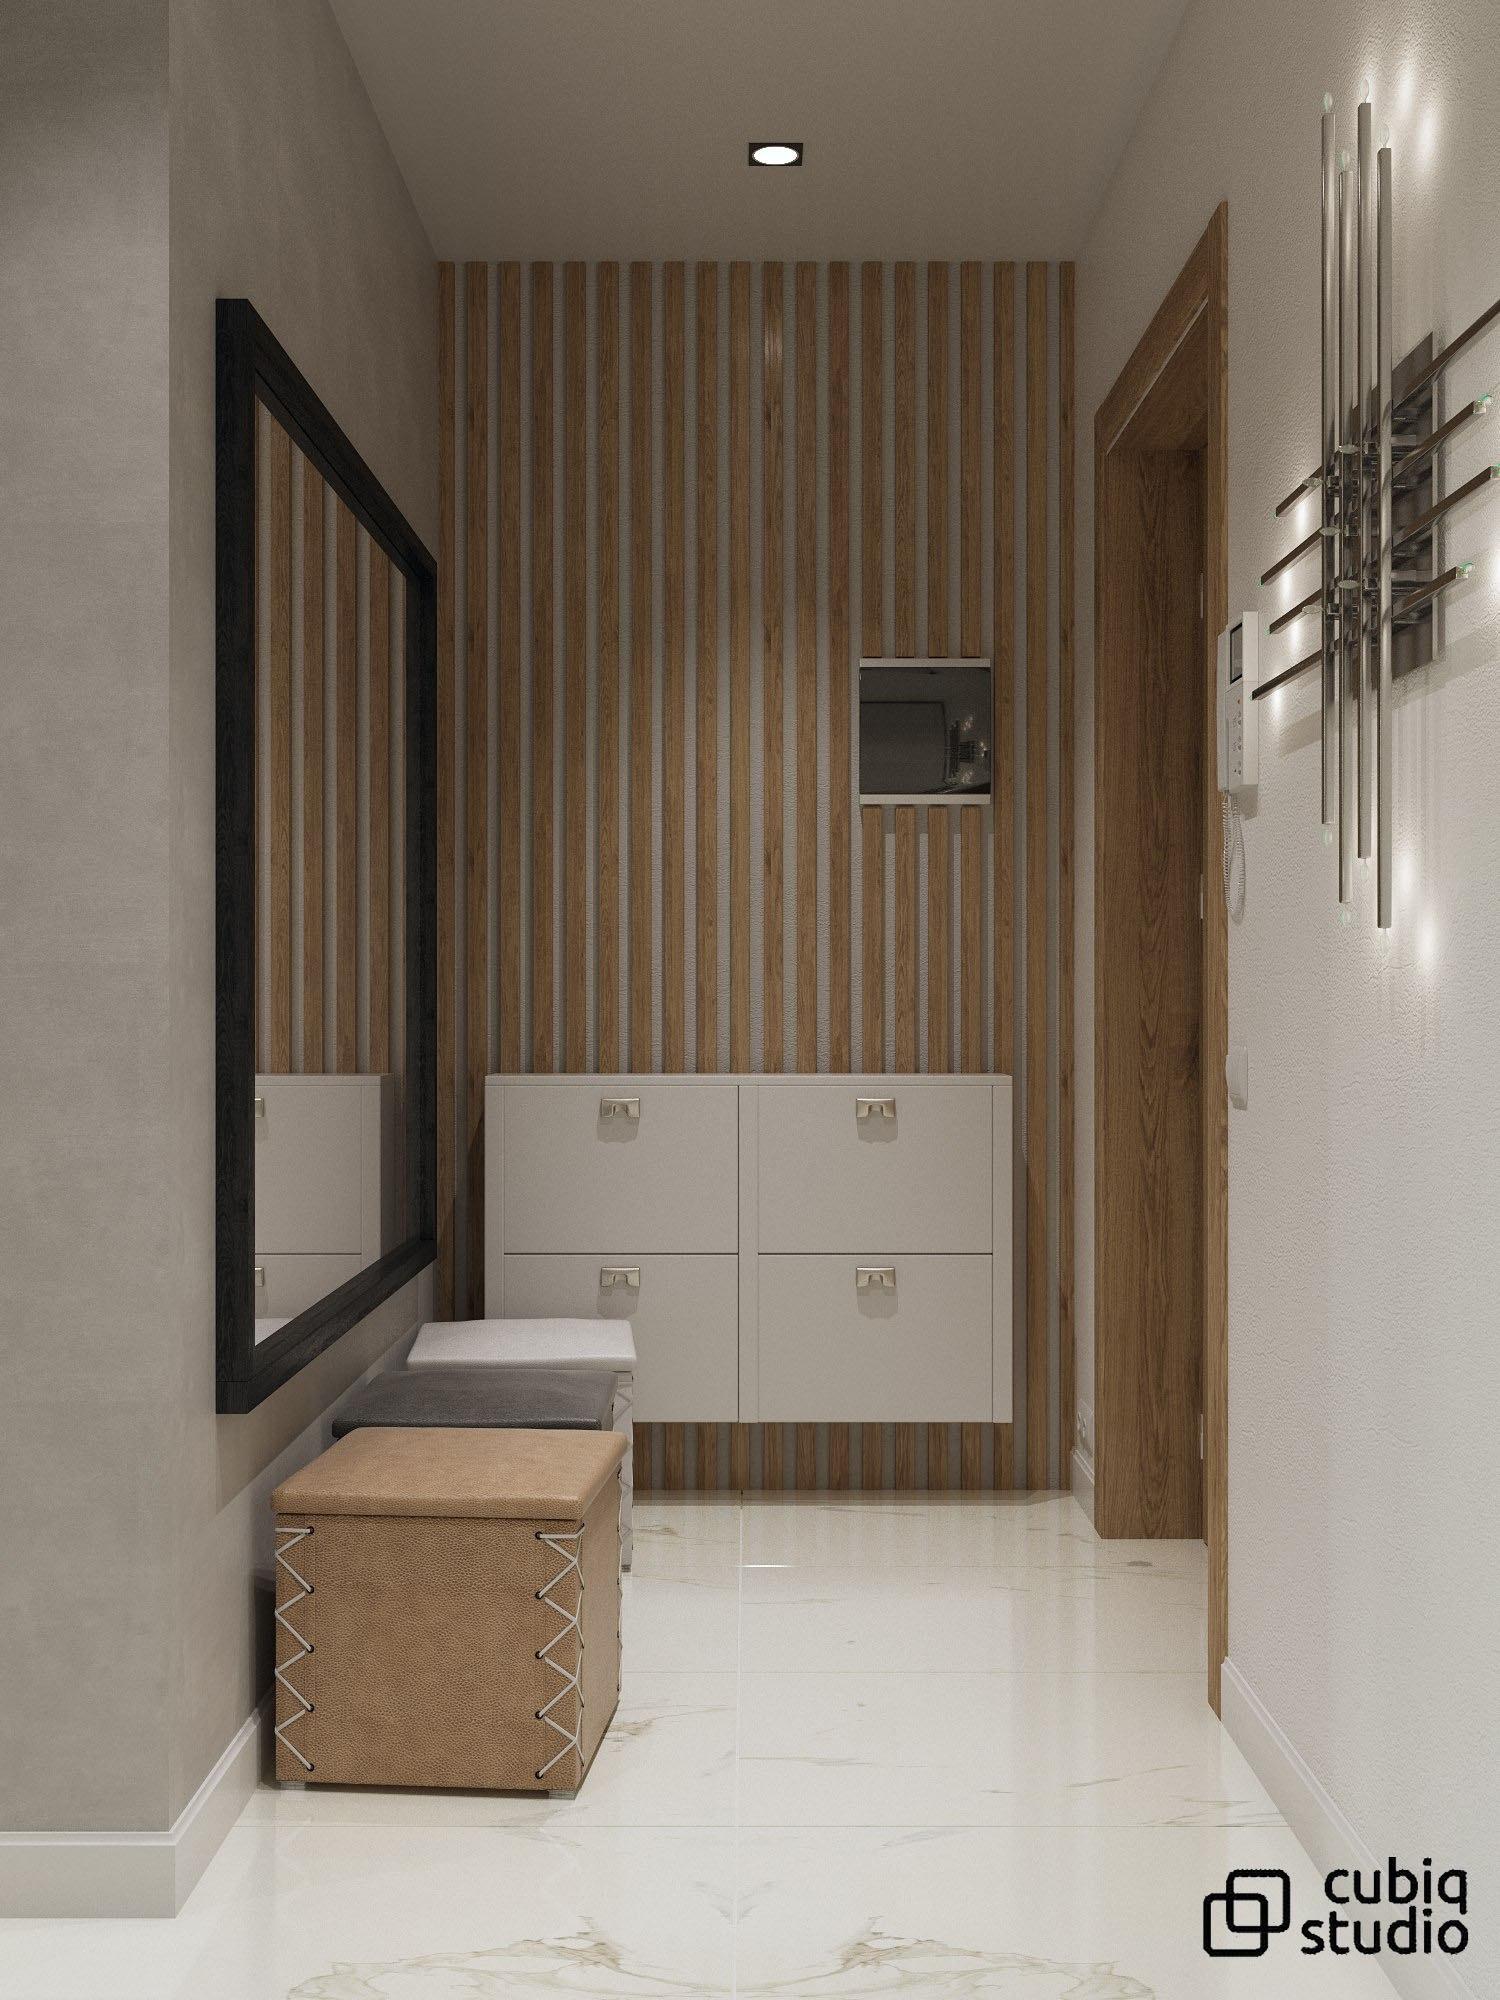 Однокомнатная квартира для холостяка 36 кв м.